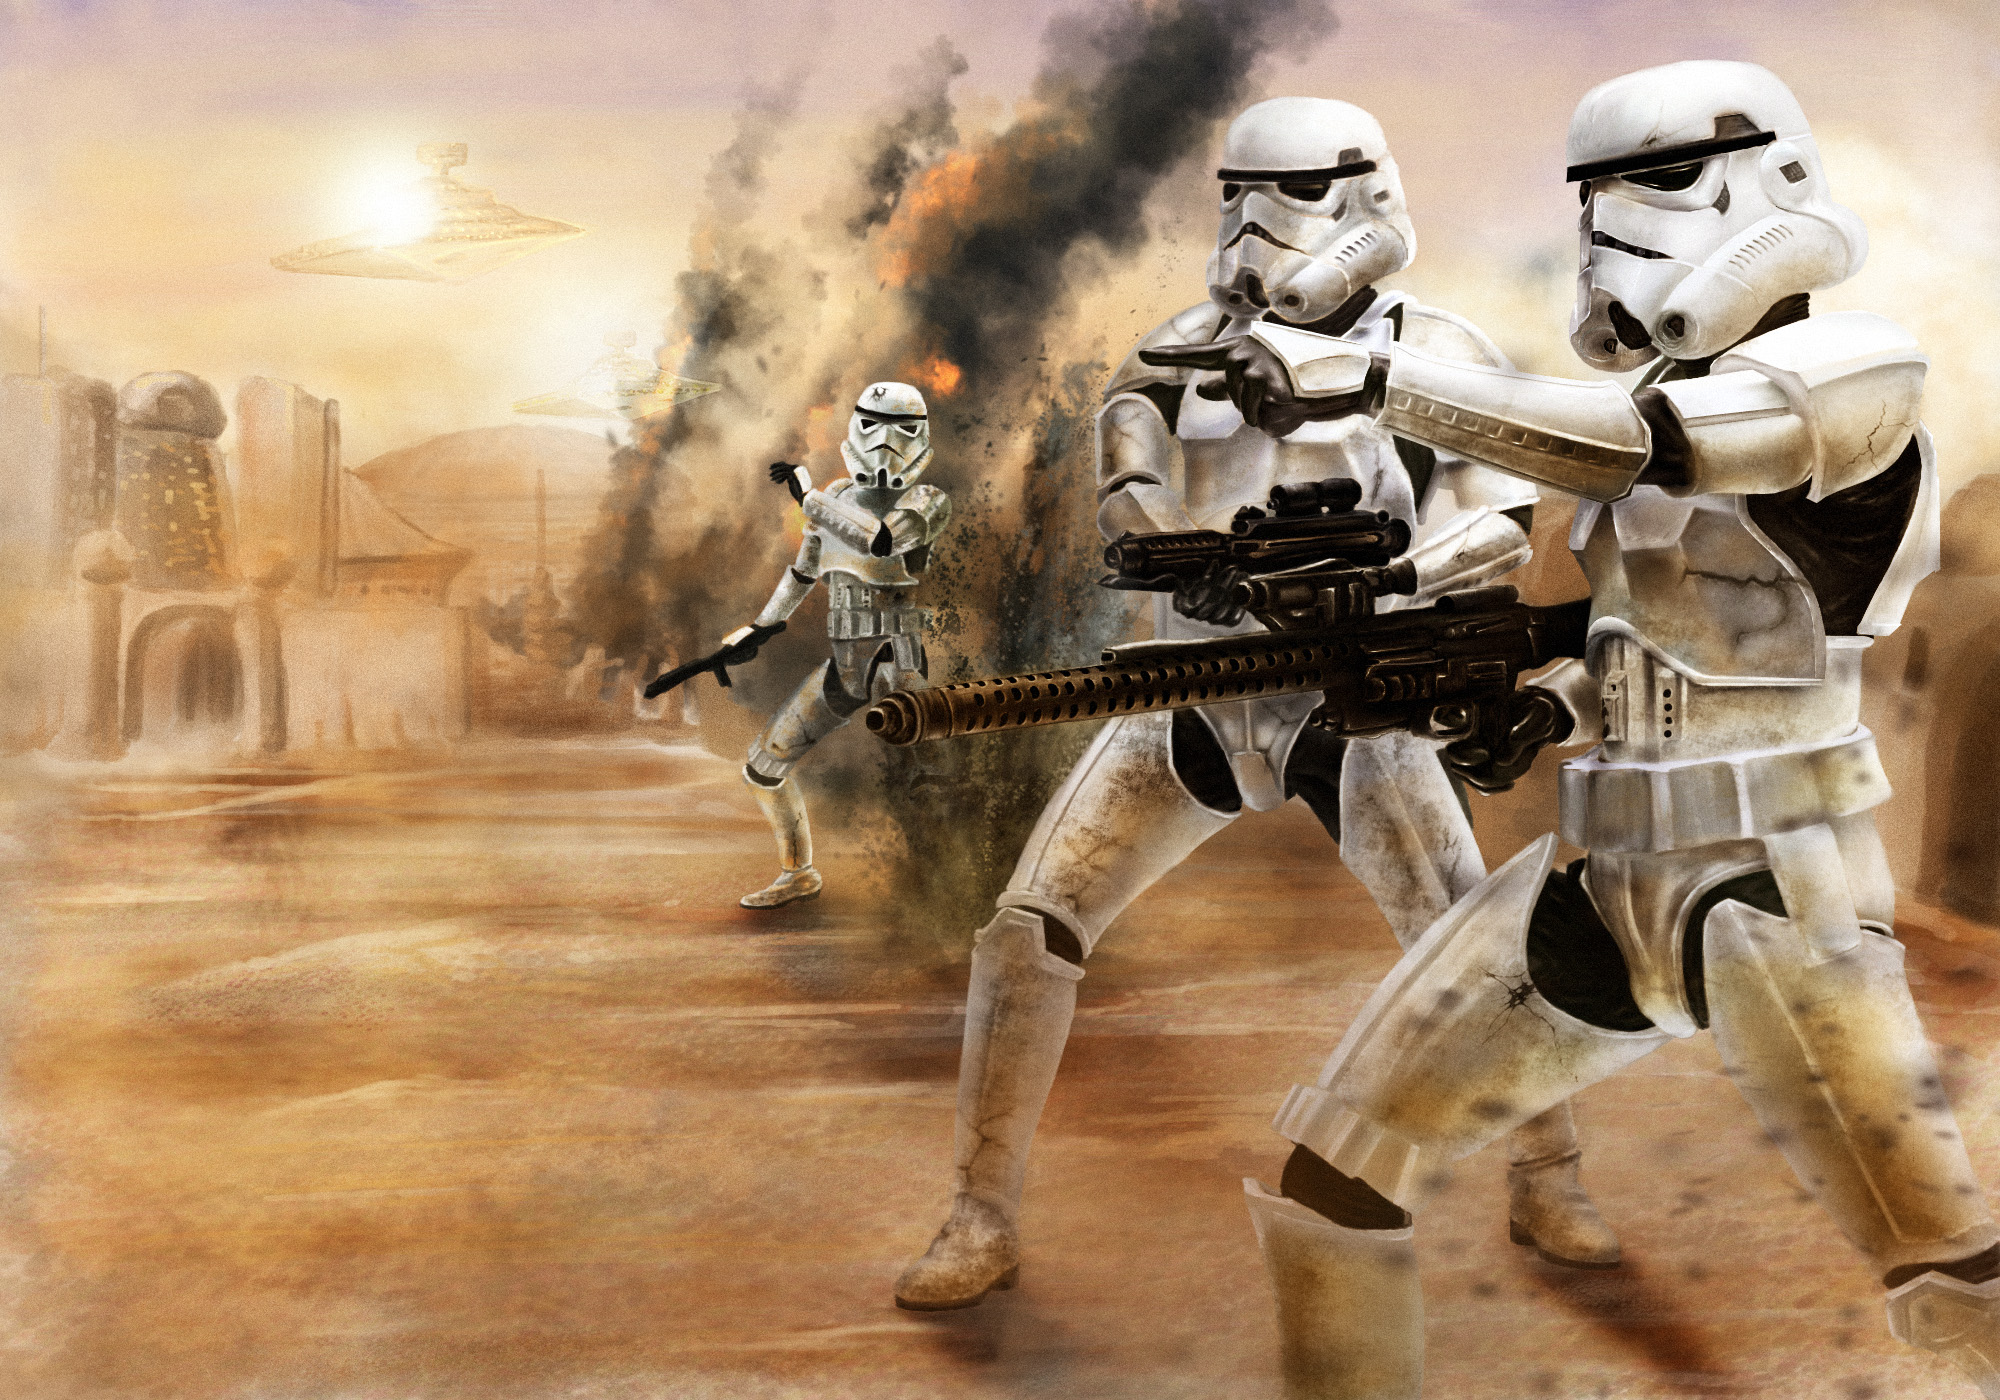 epic star wars trooper wallpaper - photo #11